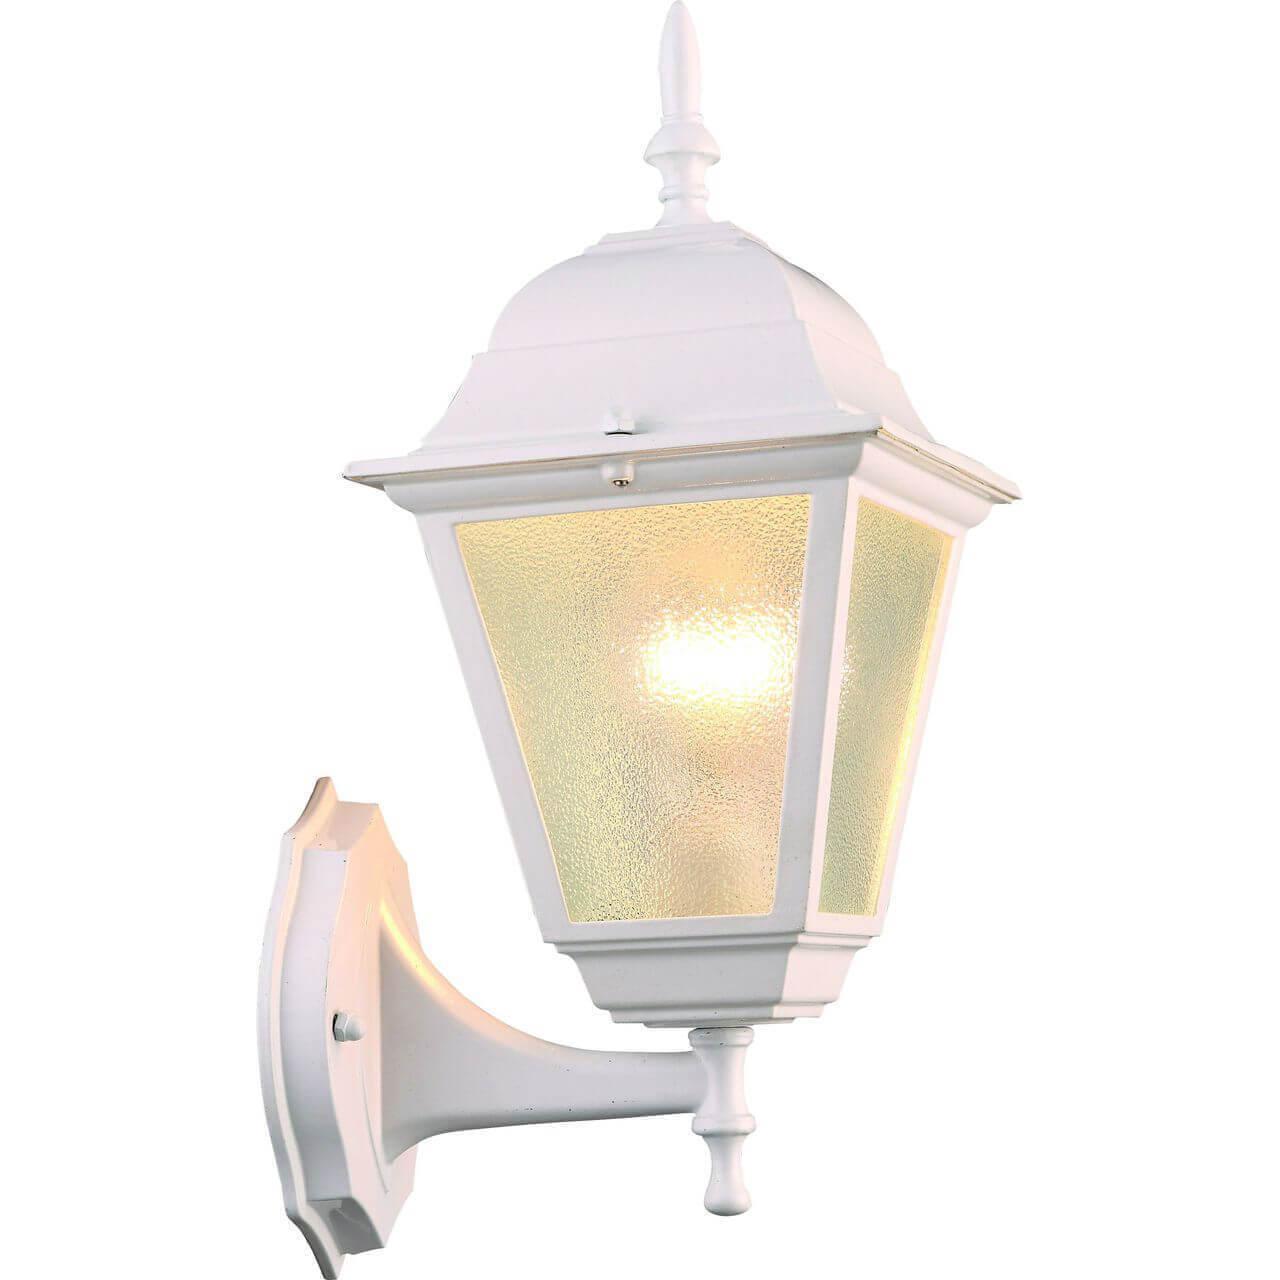 Уличный светильник Arte Lamp A1011AL-1WH, E27 arte lamp a9518pl 2ba